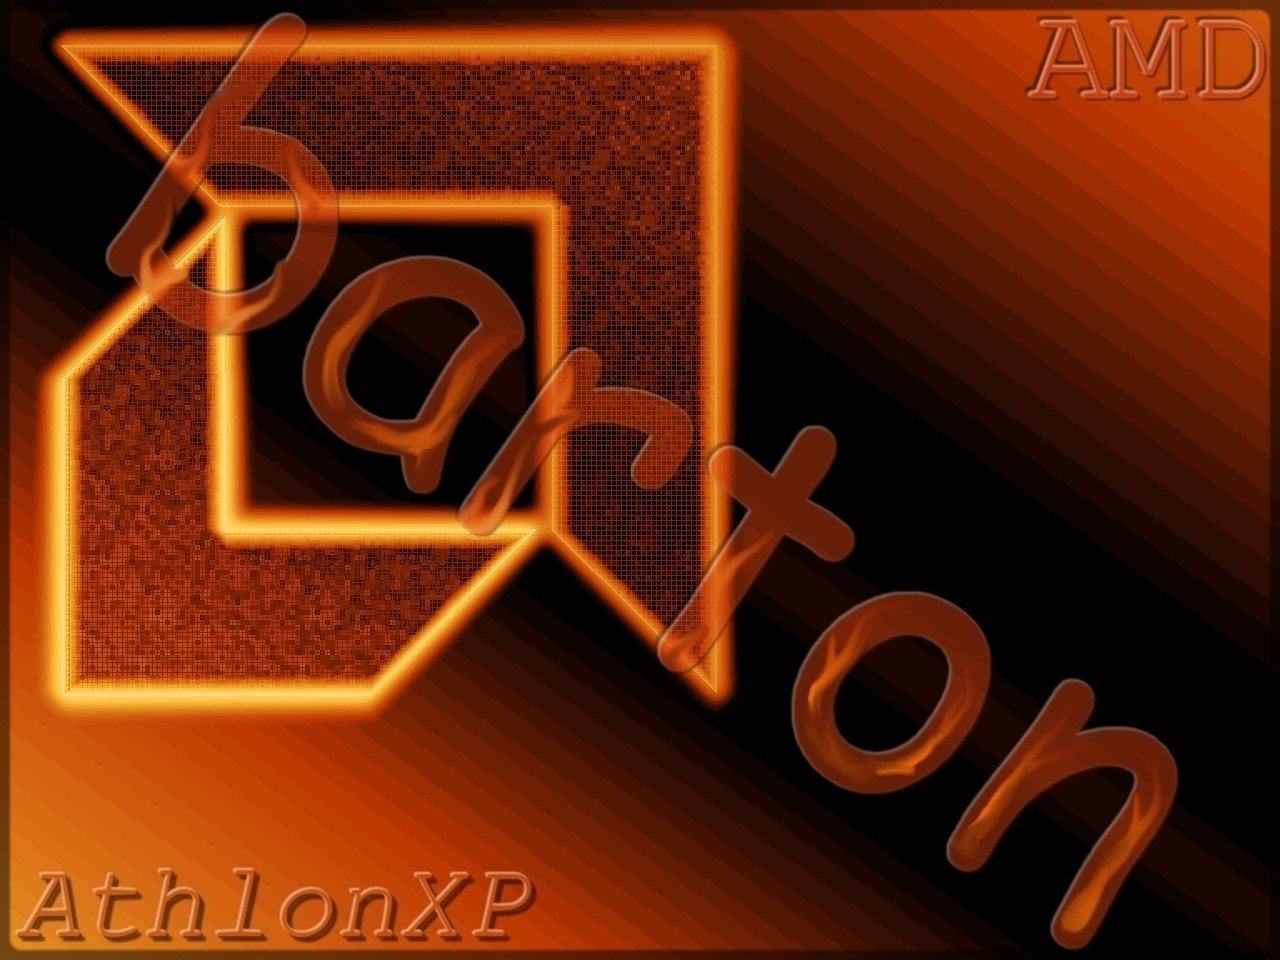 Image ID: 321458